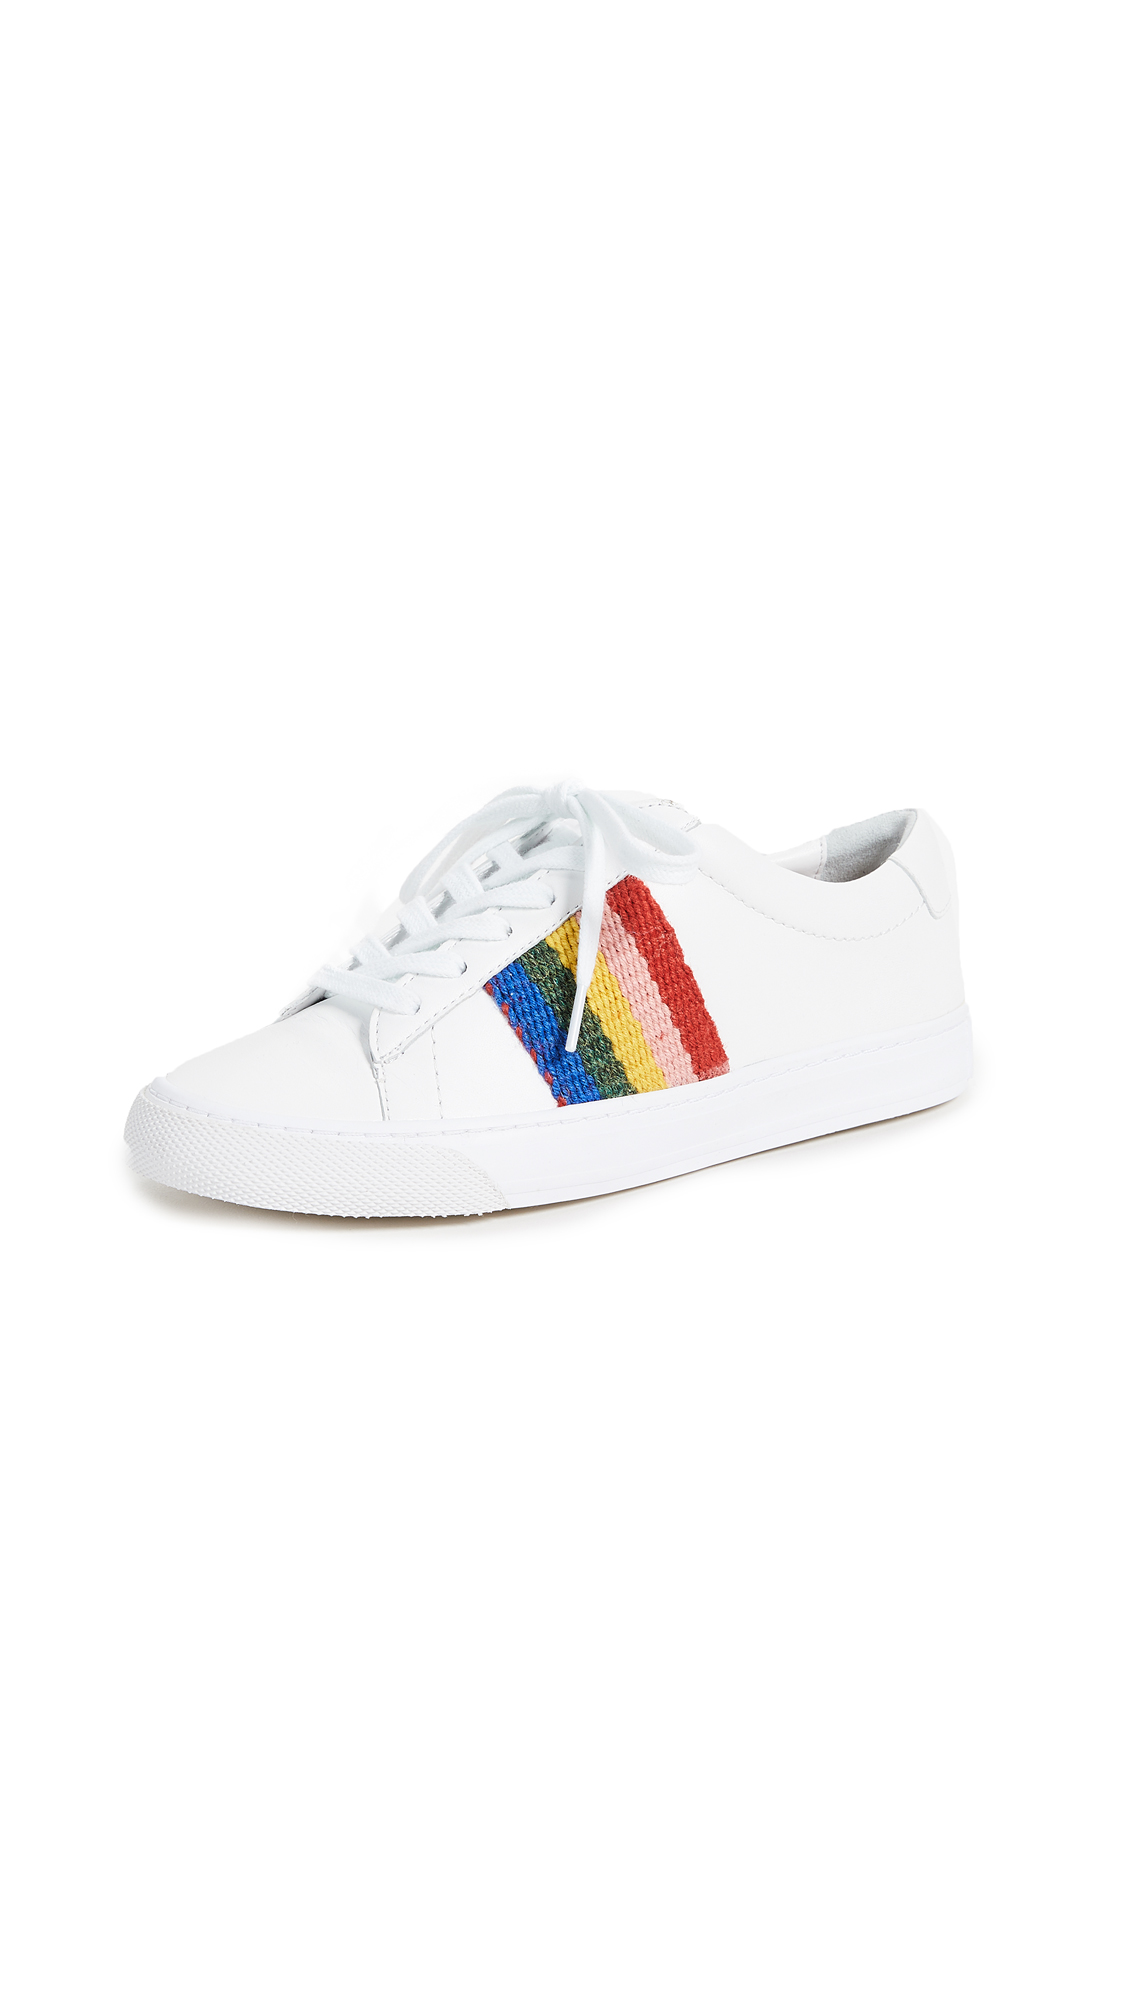 Loeffler Randall Logan Sneakers - White/Rainbow